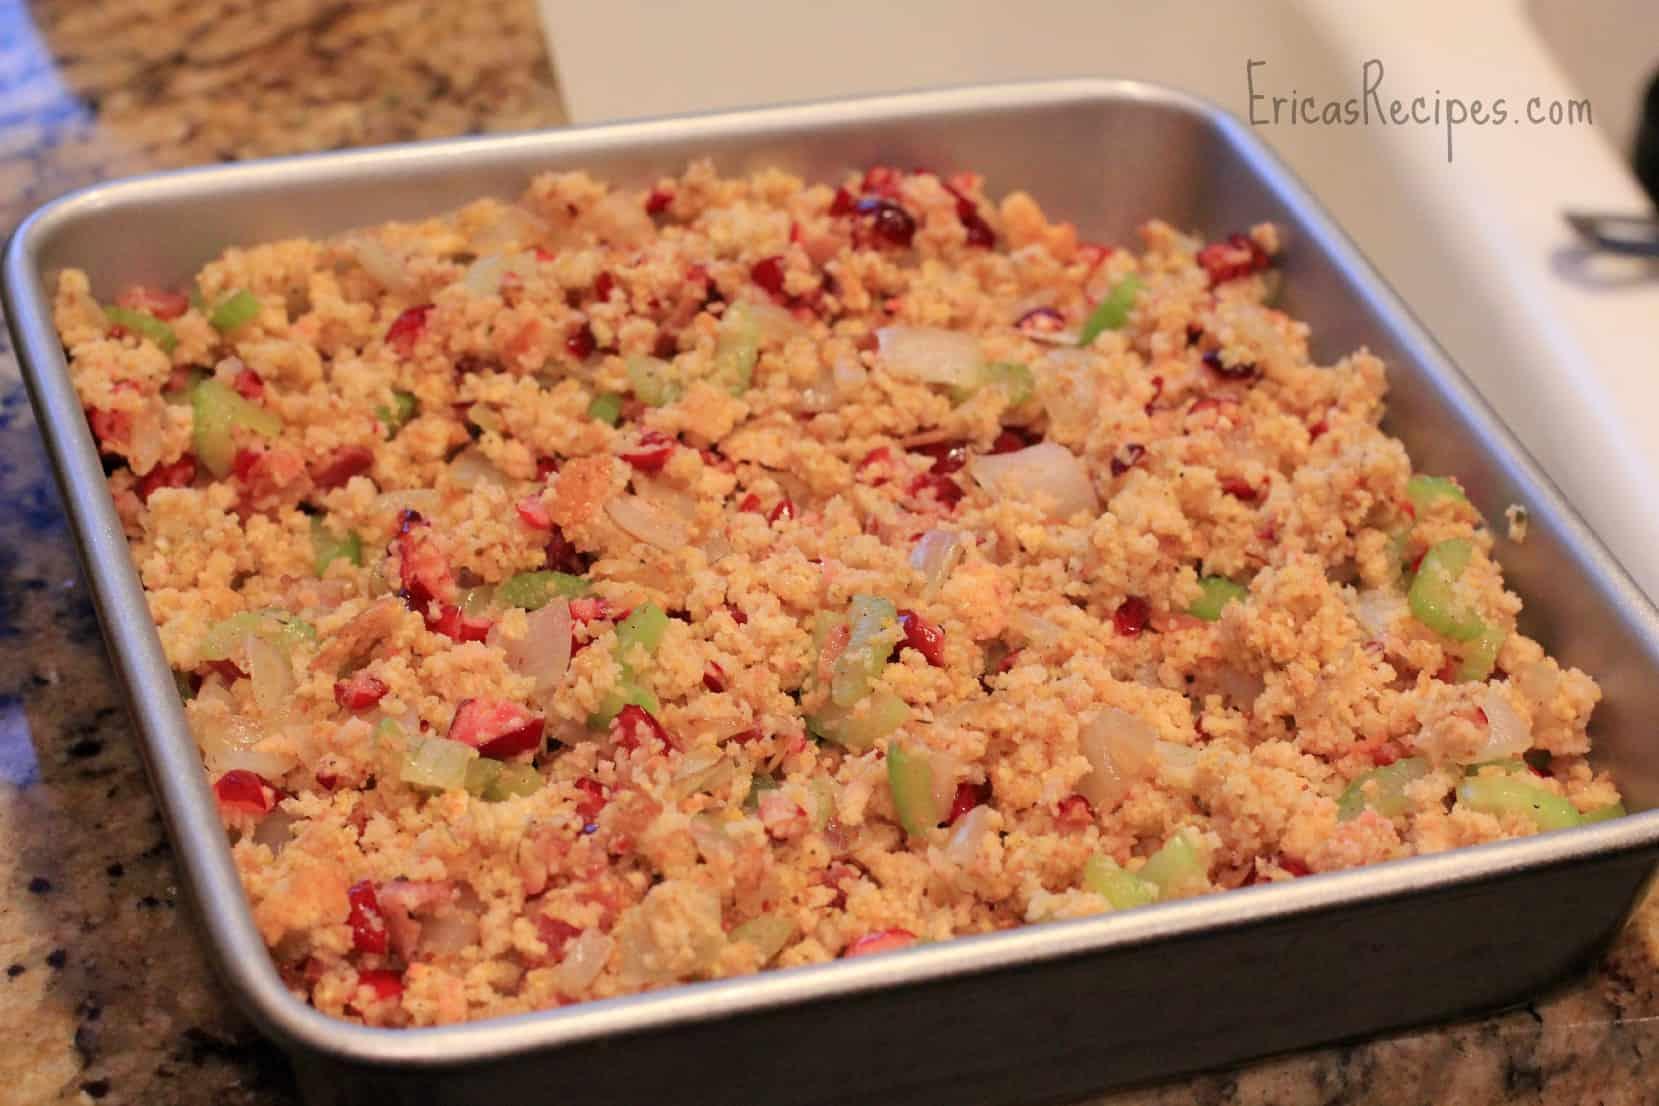 Cranberry & Bacon Cornbread Stuffing - Erica's Recipes